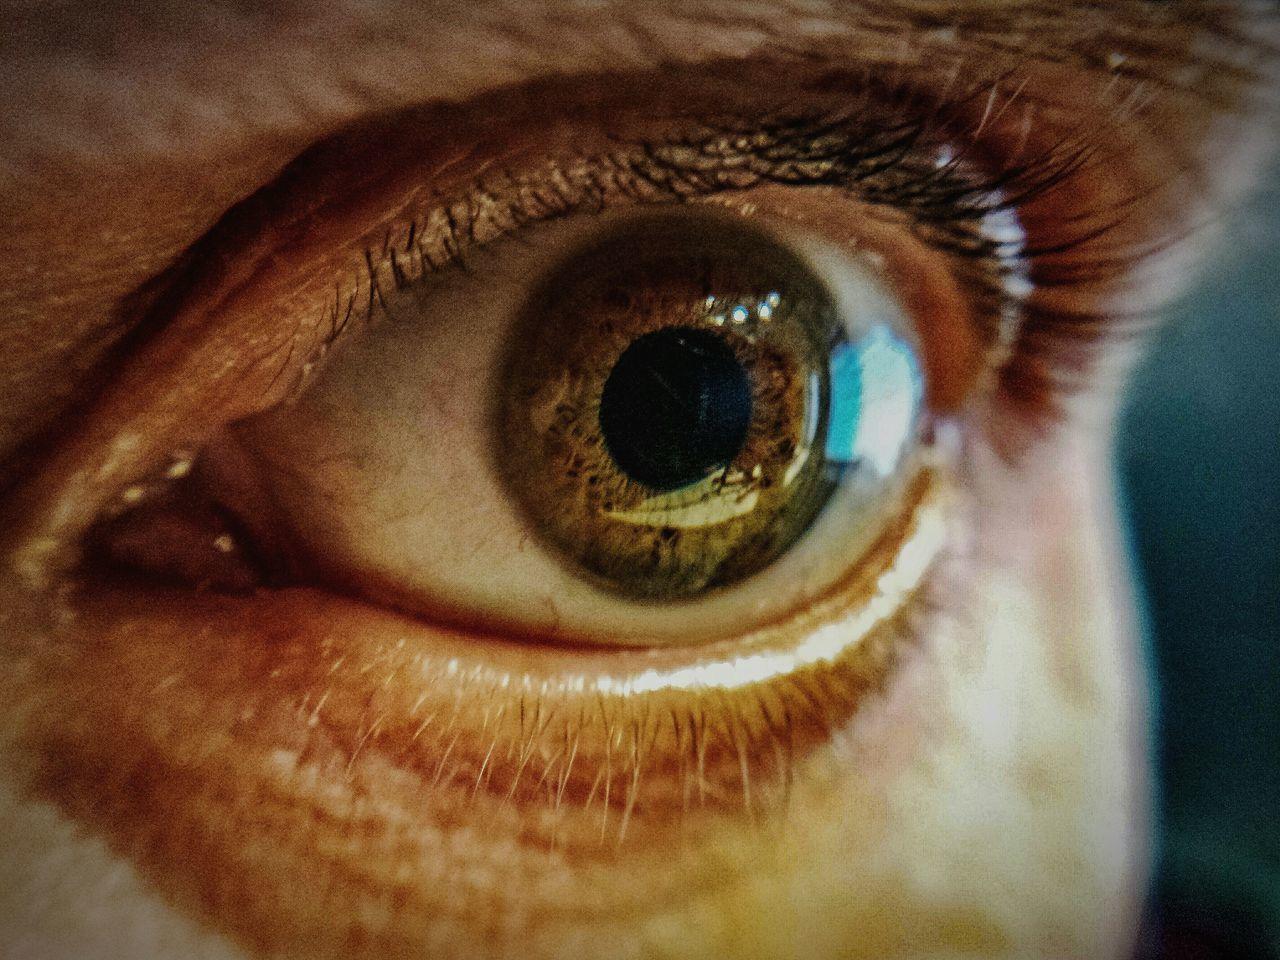 Eyelash Close-up Eyesight Iris - Eye Eyeball Human Eye Sensory Perception Macro_captures Macro_perfection Personal Perspective EyeEm Masterclass Samsung Galaxy S4 Capture The Moment Focus On Foreground From My Point Of View Eye4photography  EyeEm Best Shots EyeEm Macrophotography